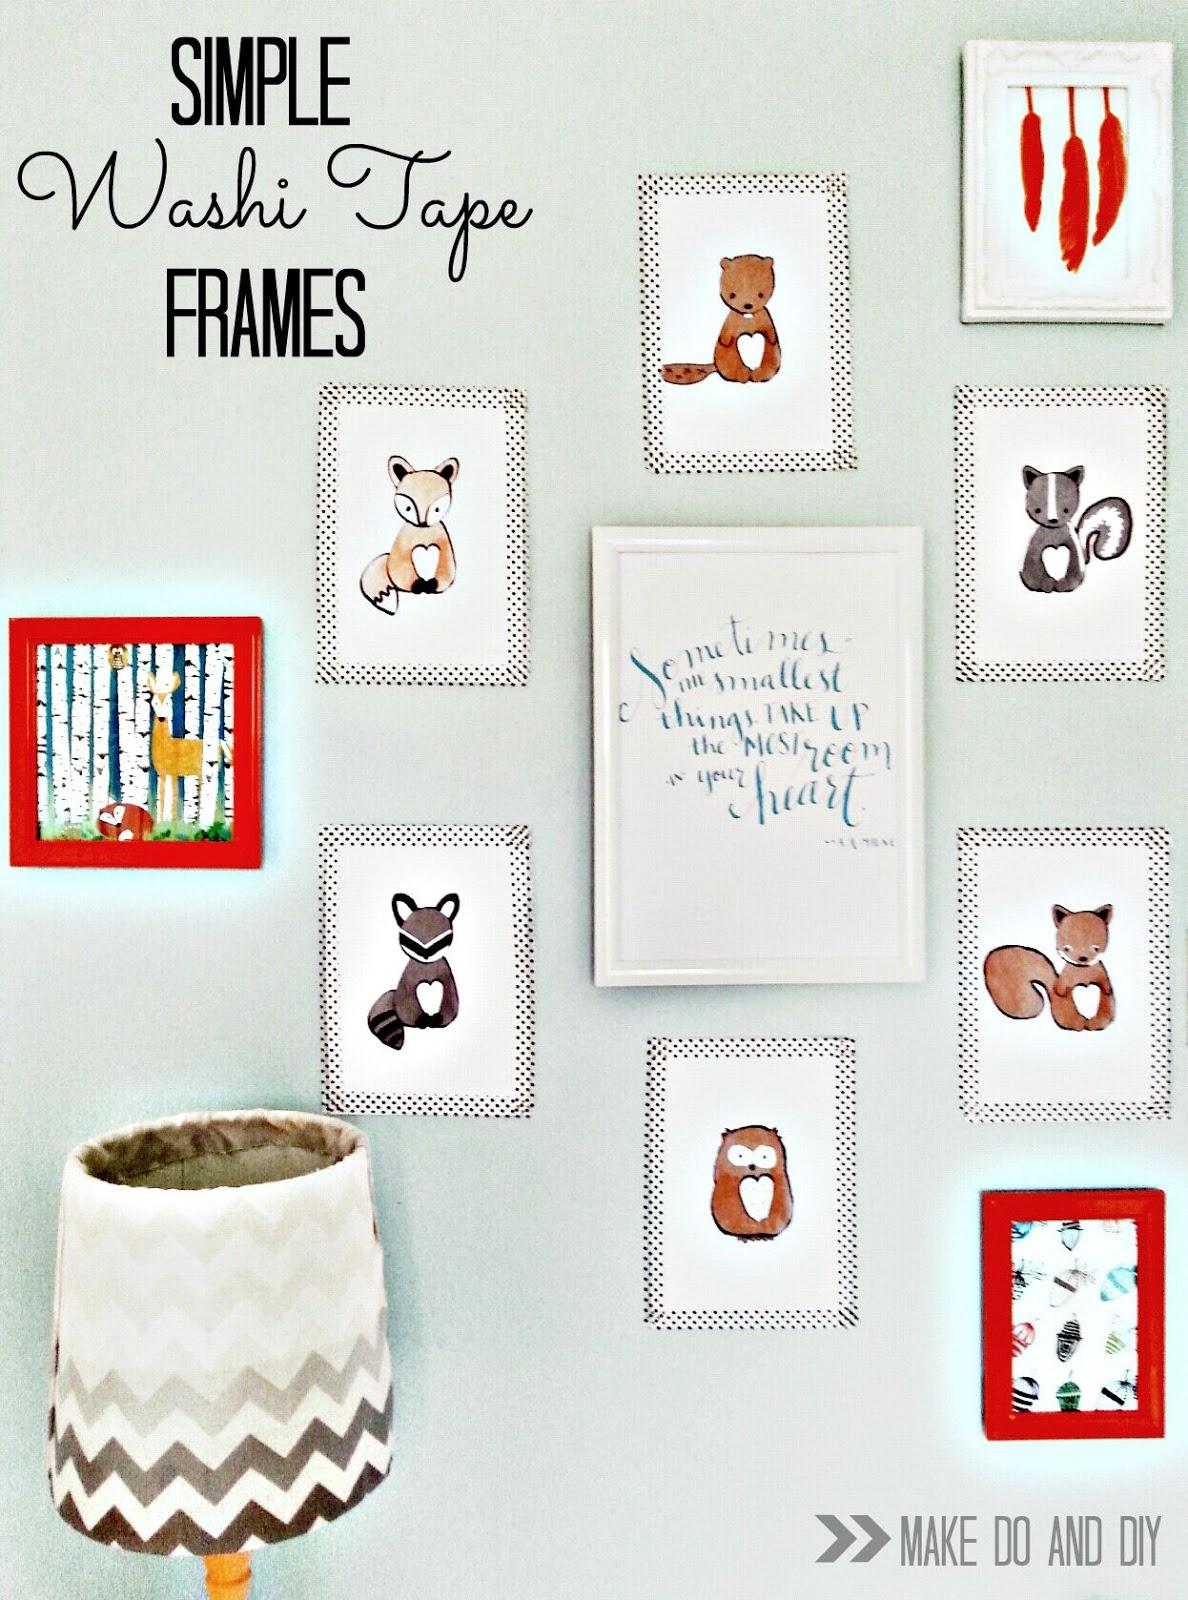 Washi Tape Frames Make Do And Diy